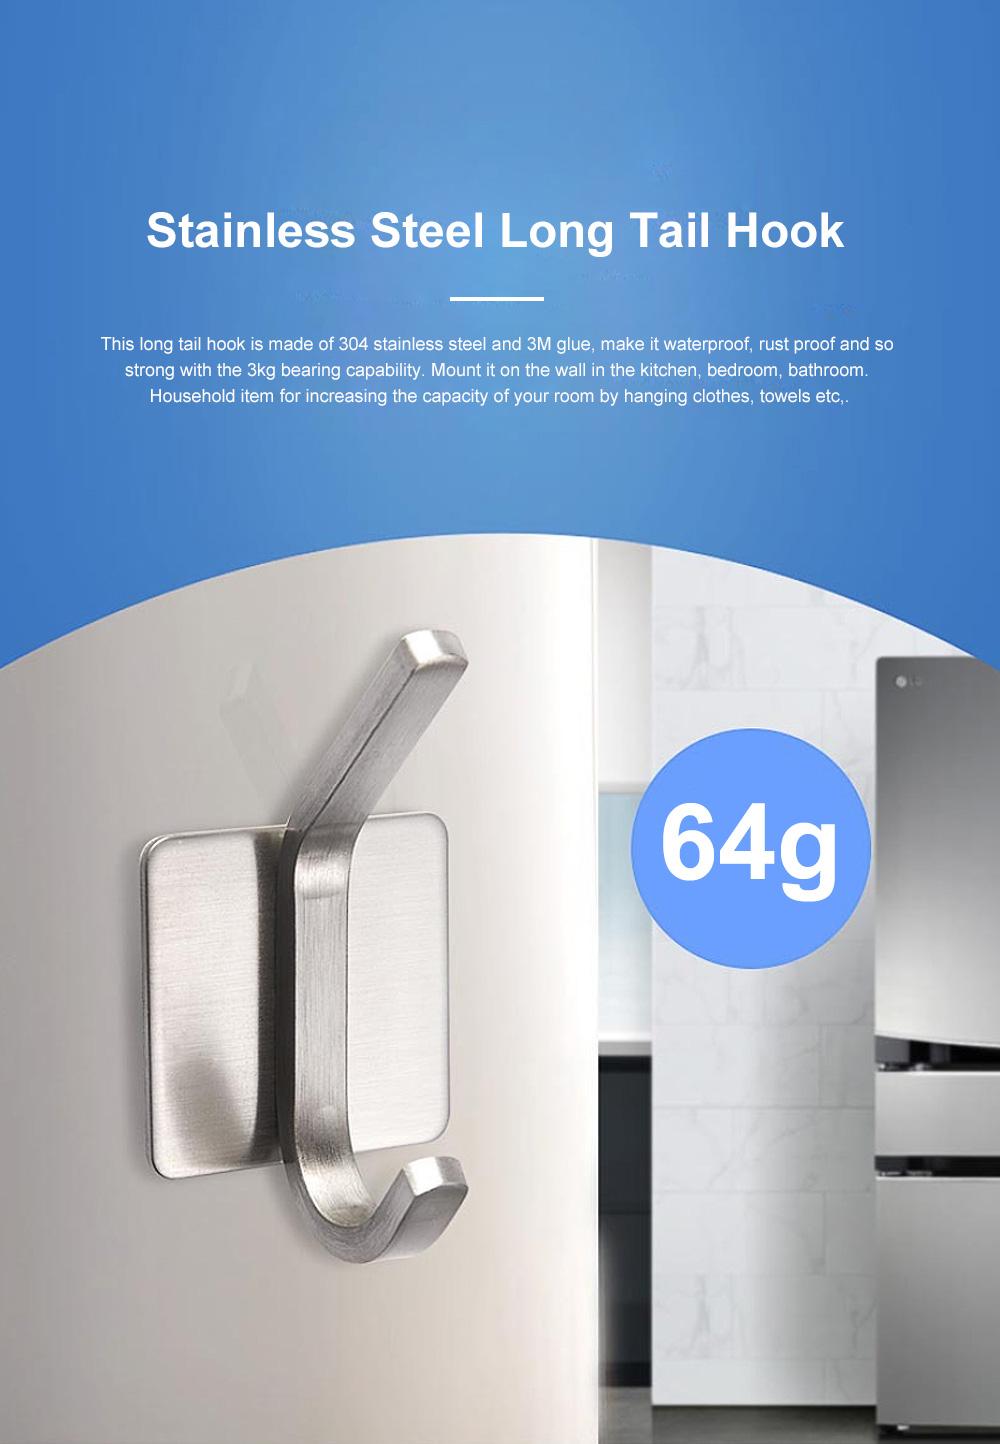 3M Glue Long Tail Hooks for Kitchen Bathroom Bedroom Hanging Waterproof 304 Stainless Steel Wall Hooks 0